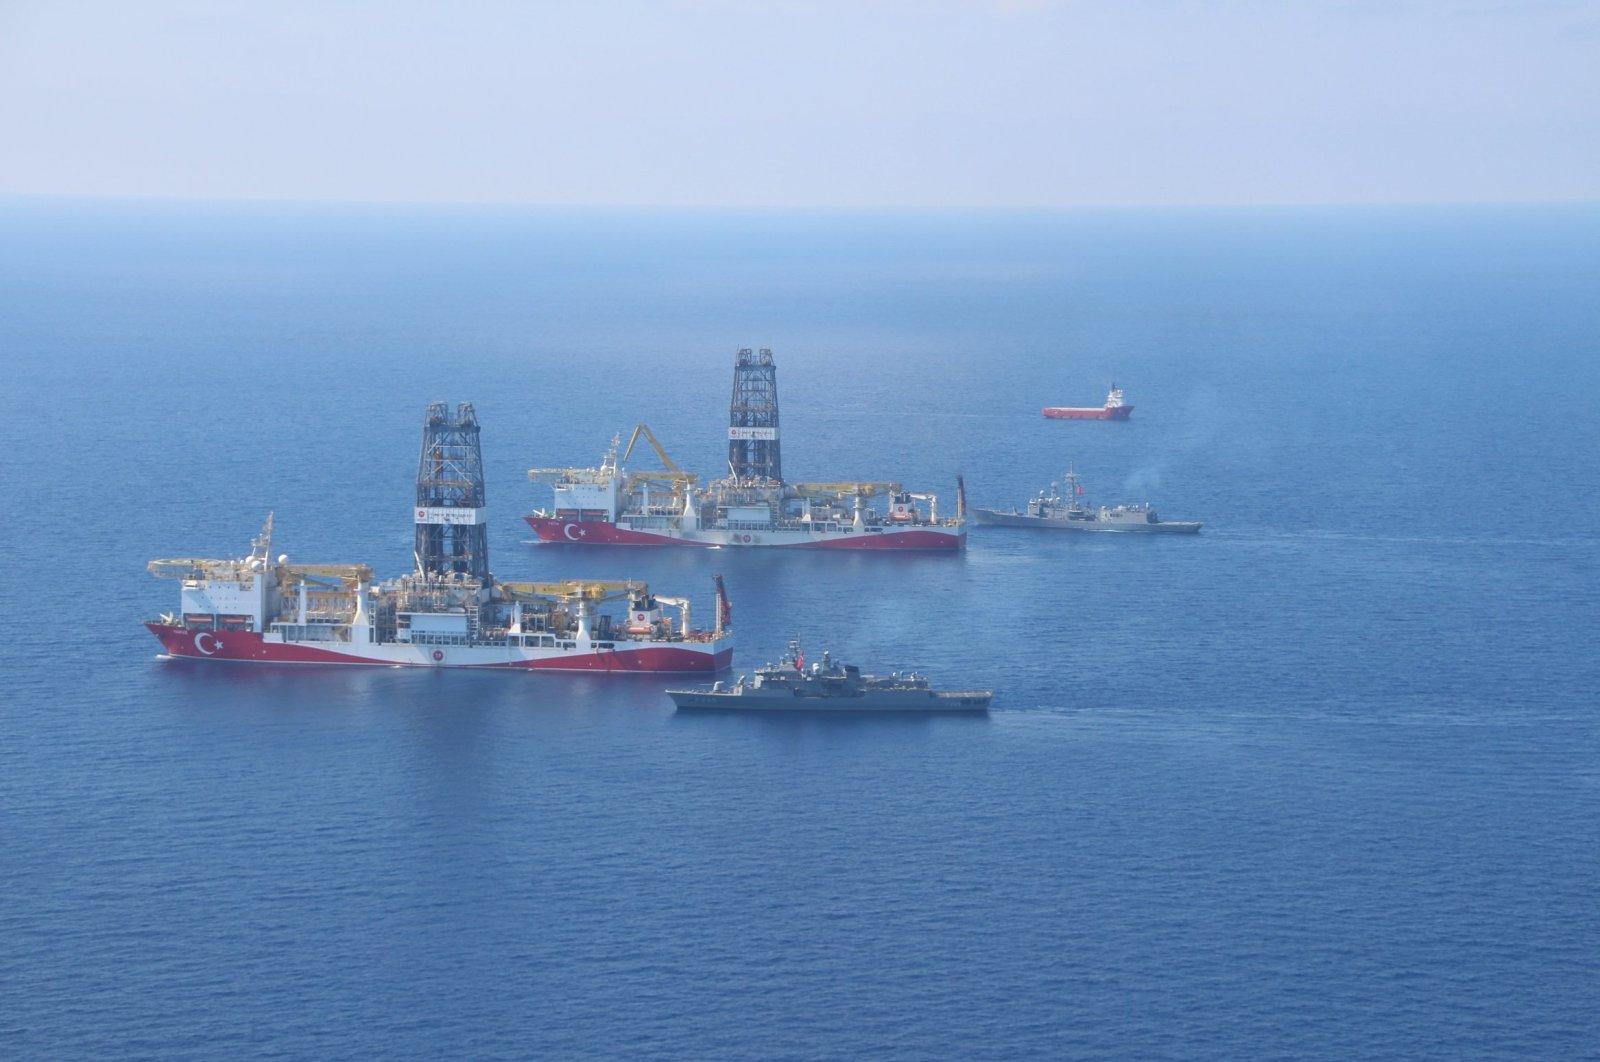 Turkish drillships in the Eastern Mediterranean, Oct. 9, 2019 (IHA File Photo)